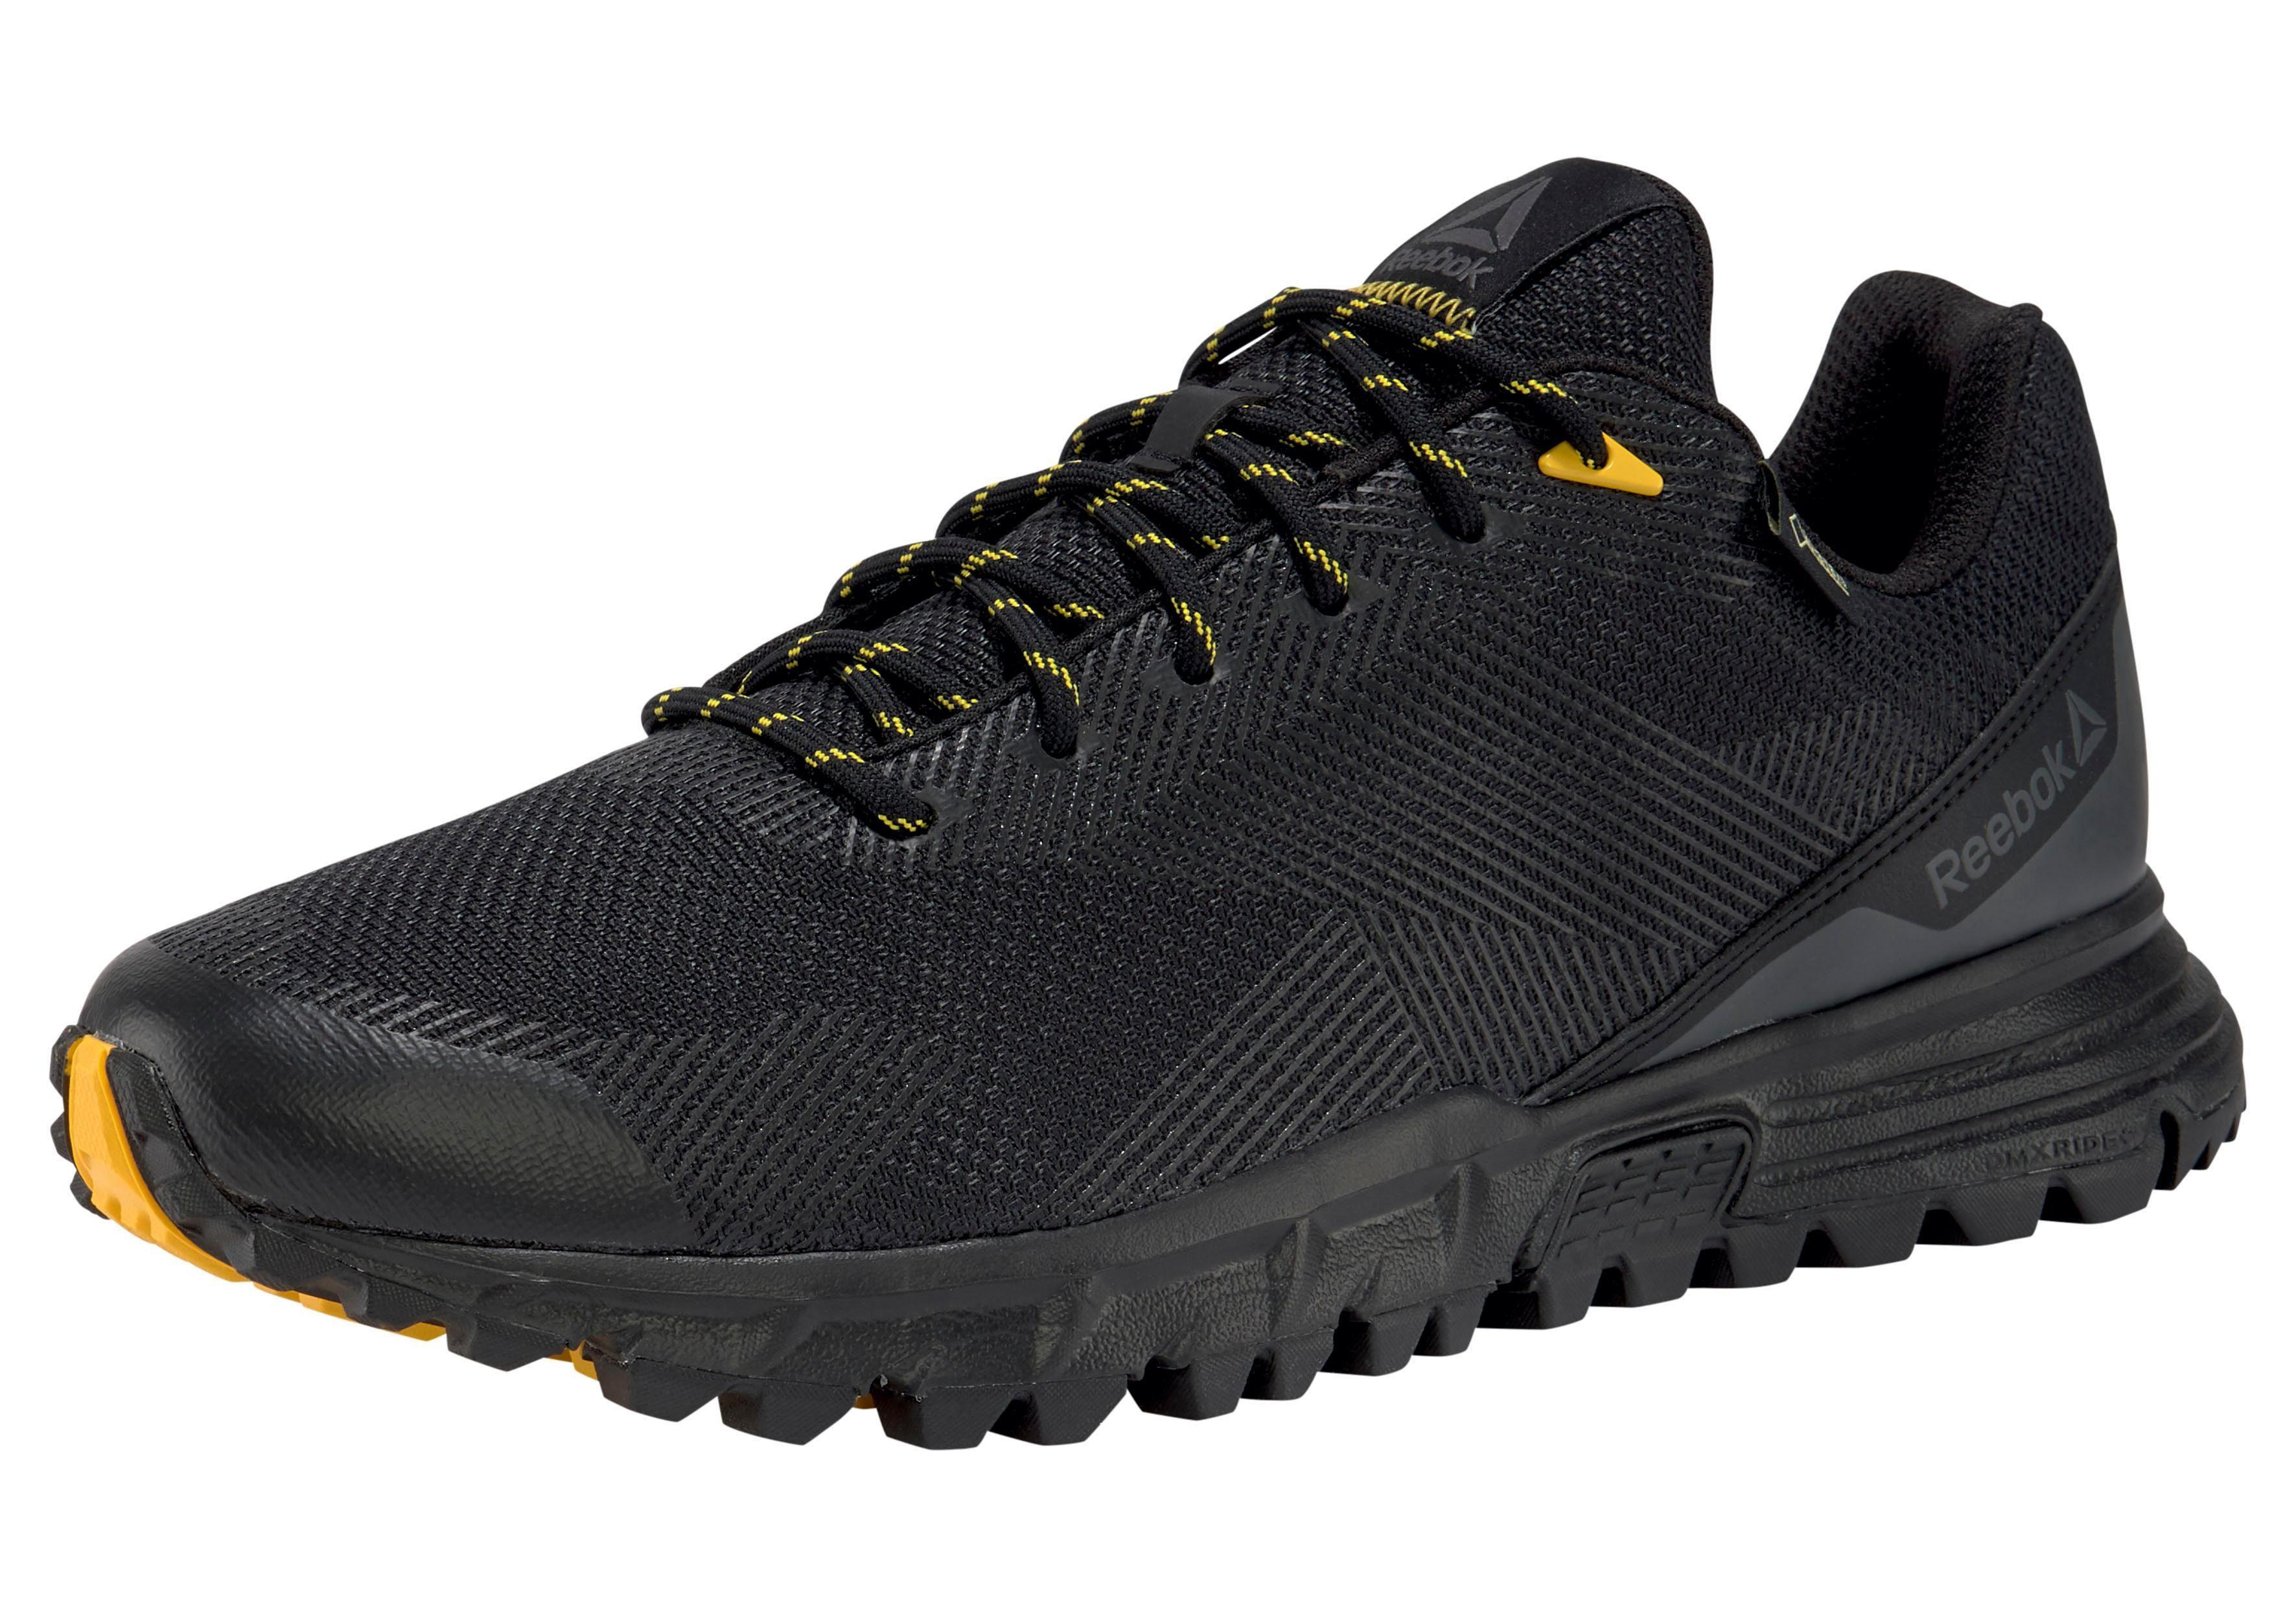 Reebok »SAWCUT 7.0 Gore Tex M« Walkingschuh kaufen | OTTO